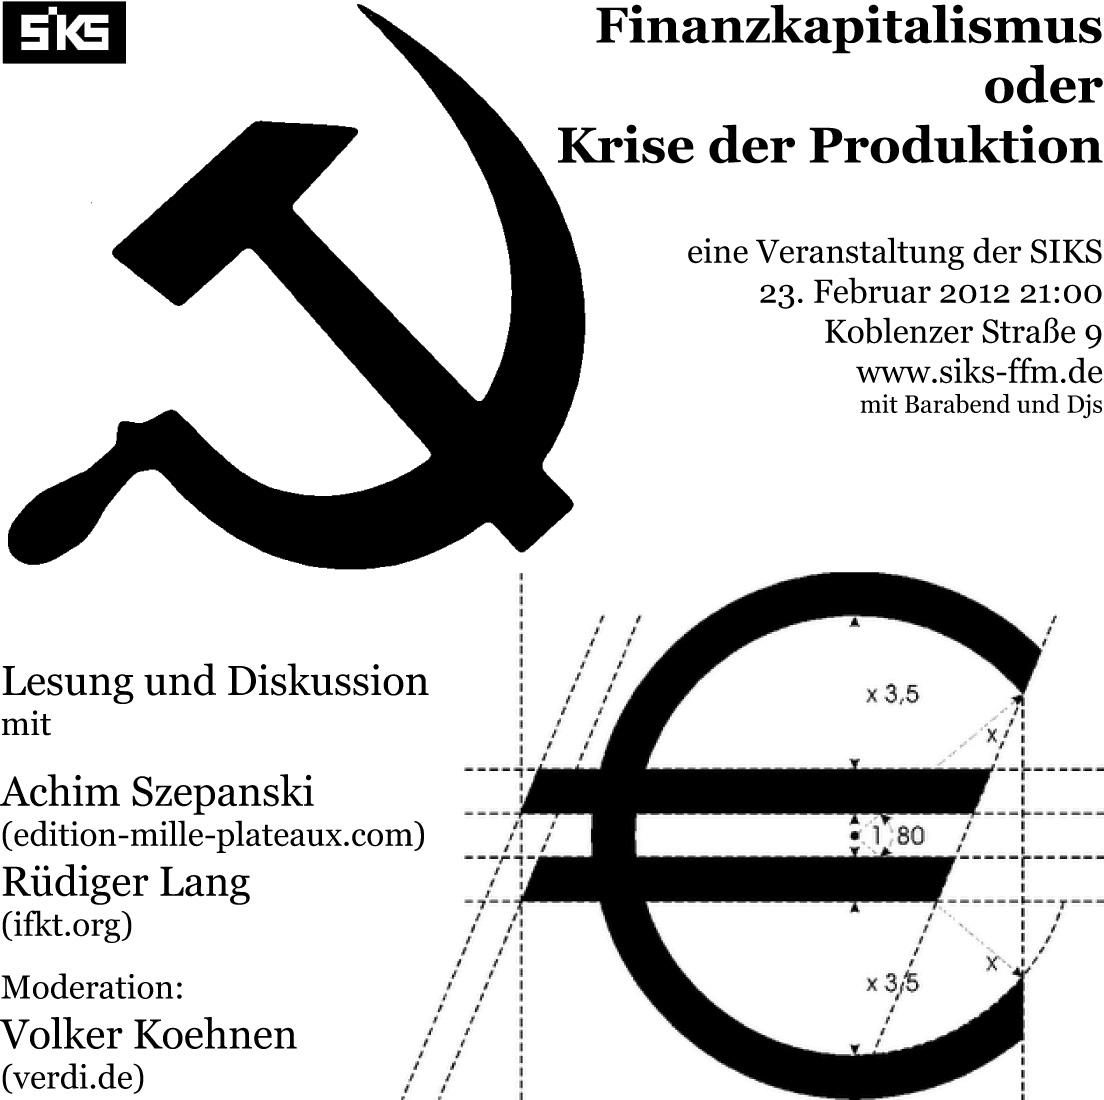 Finanzkapitalismus